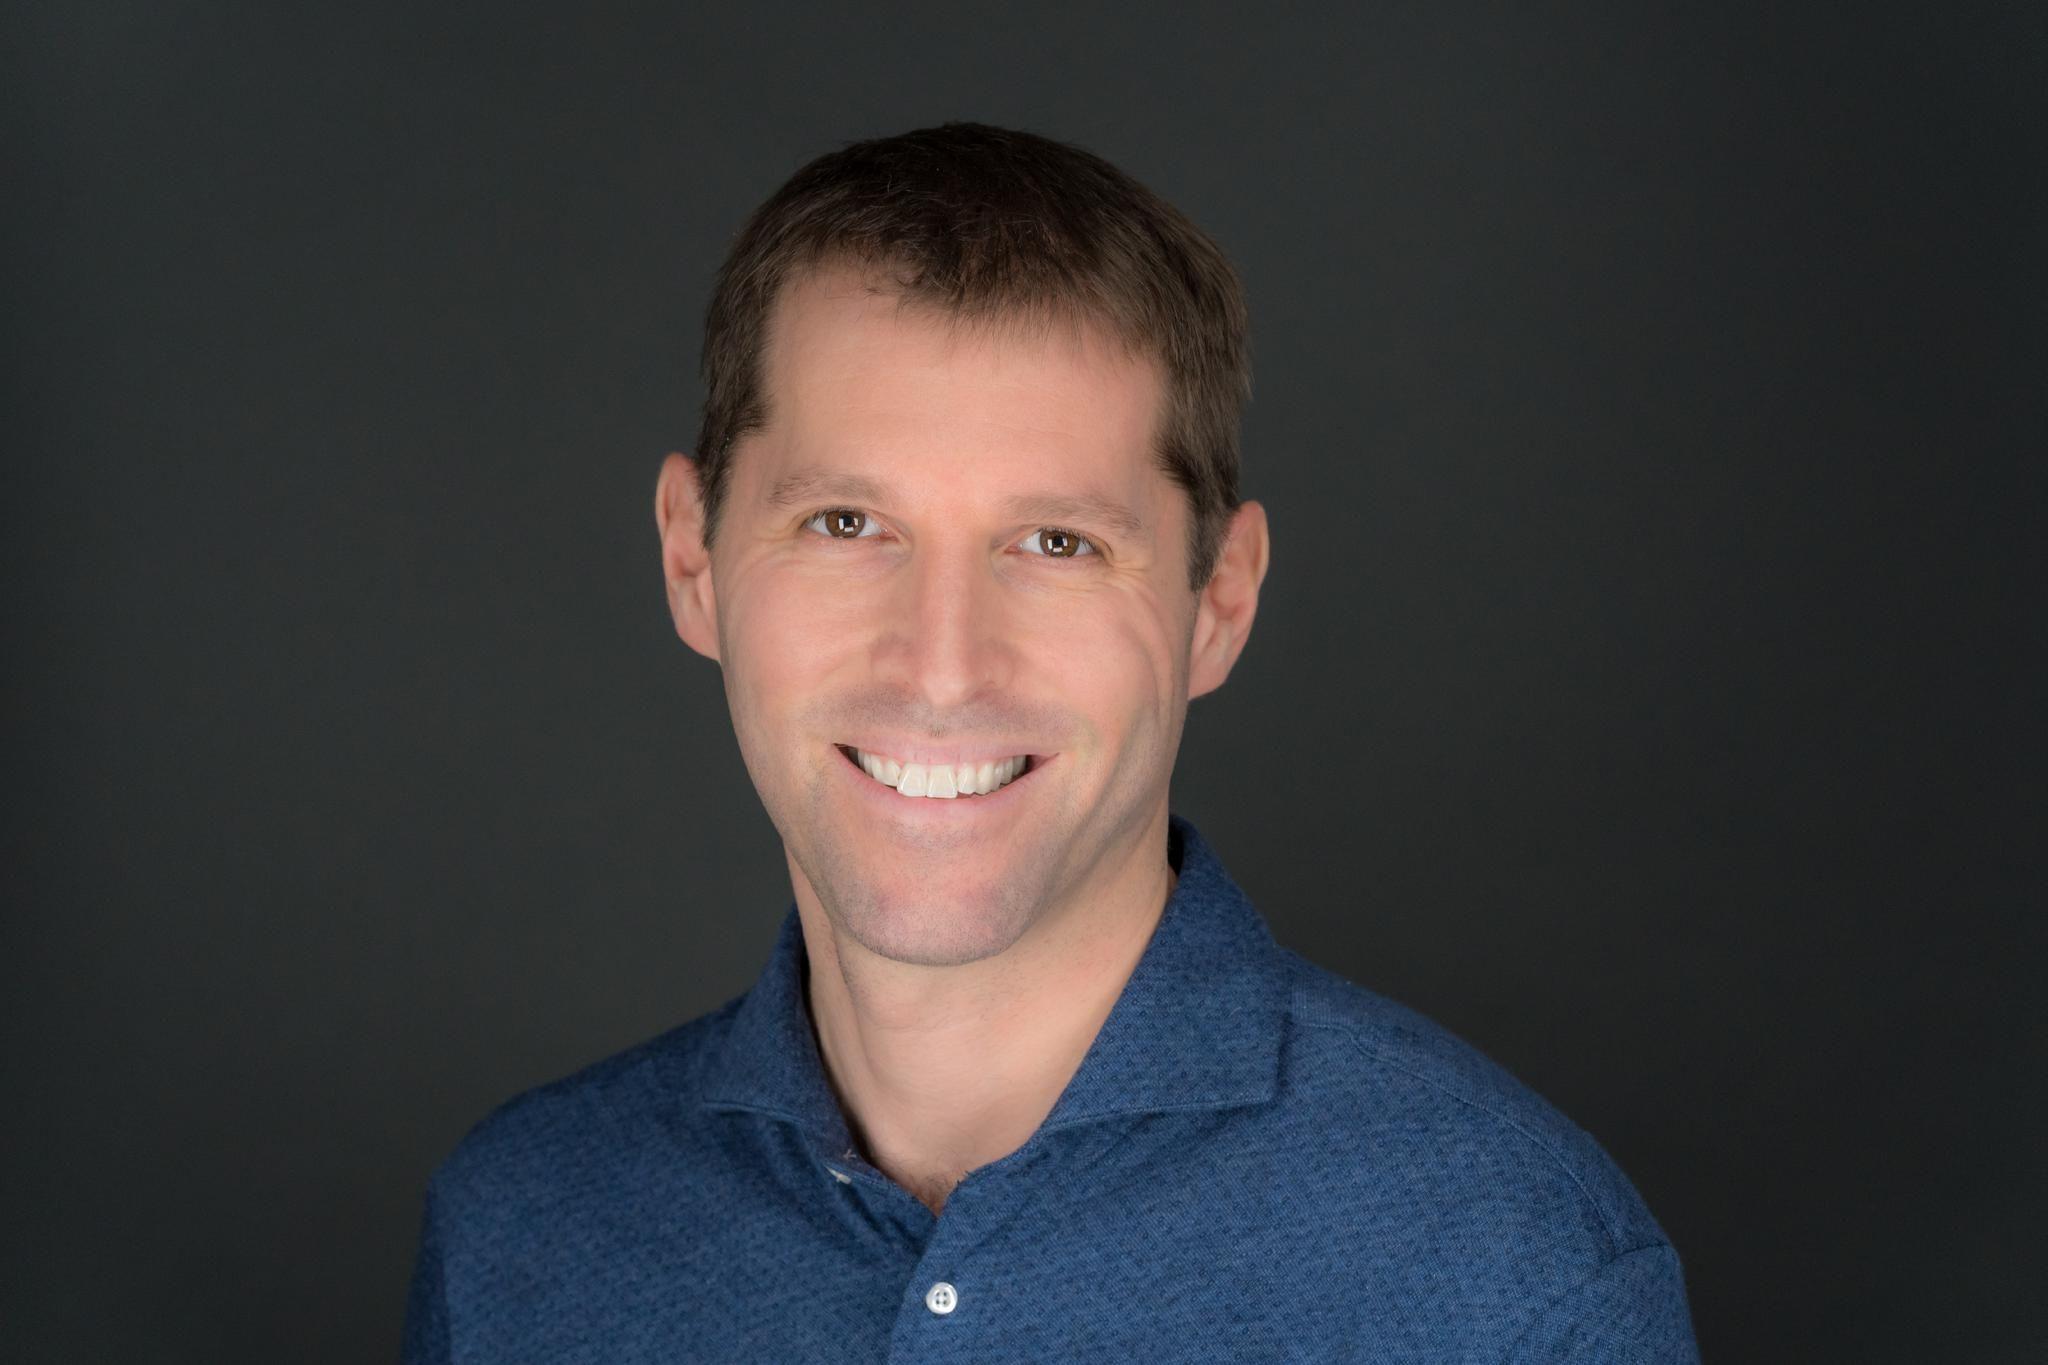 Robert Glazer, Founder & CEO, Acceleration Partners